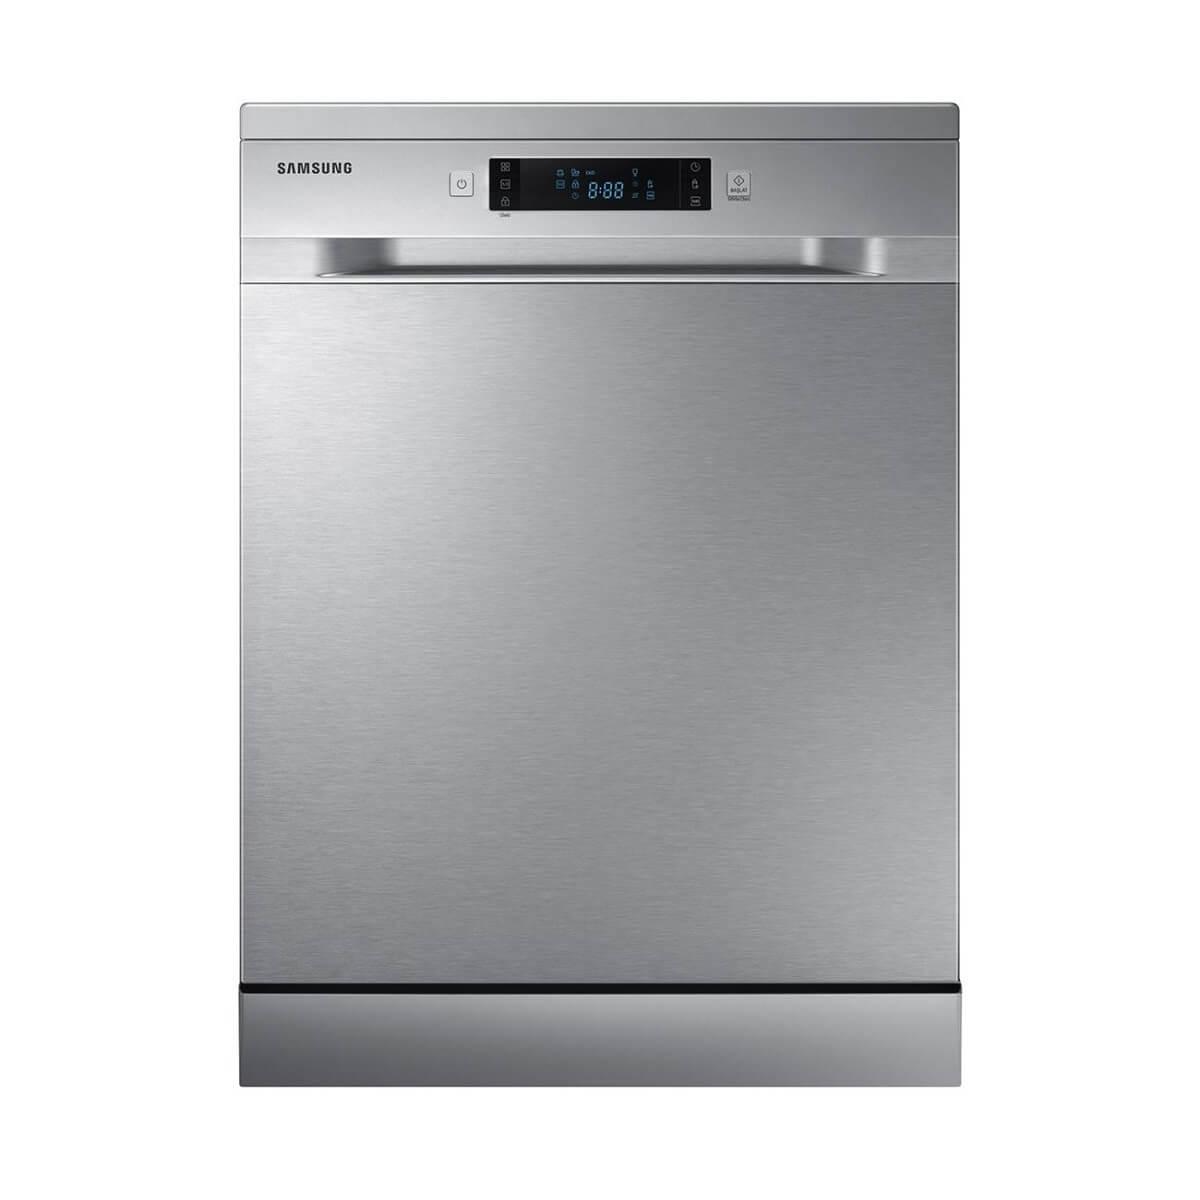 Samsung DW60M5052FS-TR Bulasik Makinesi